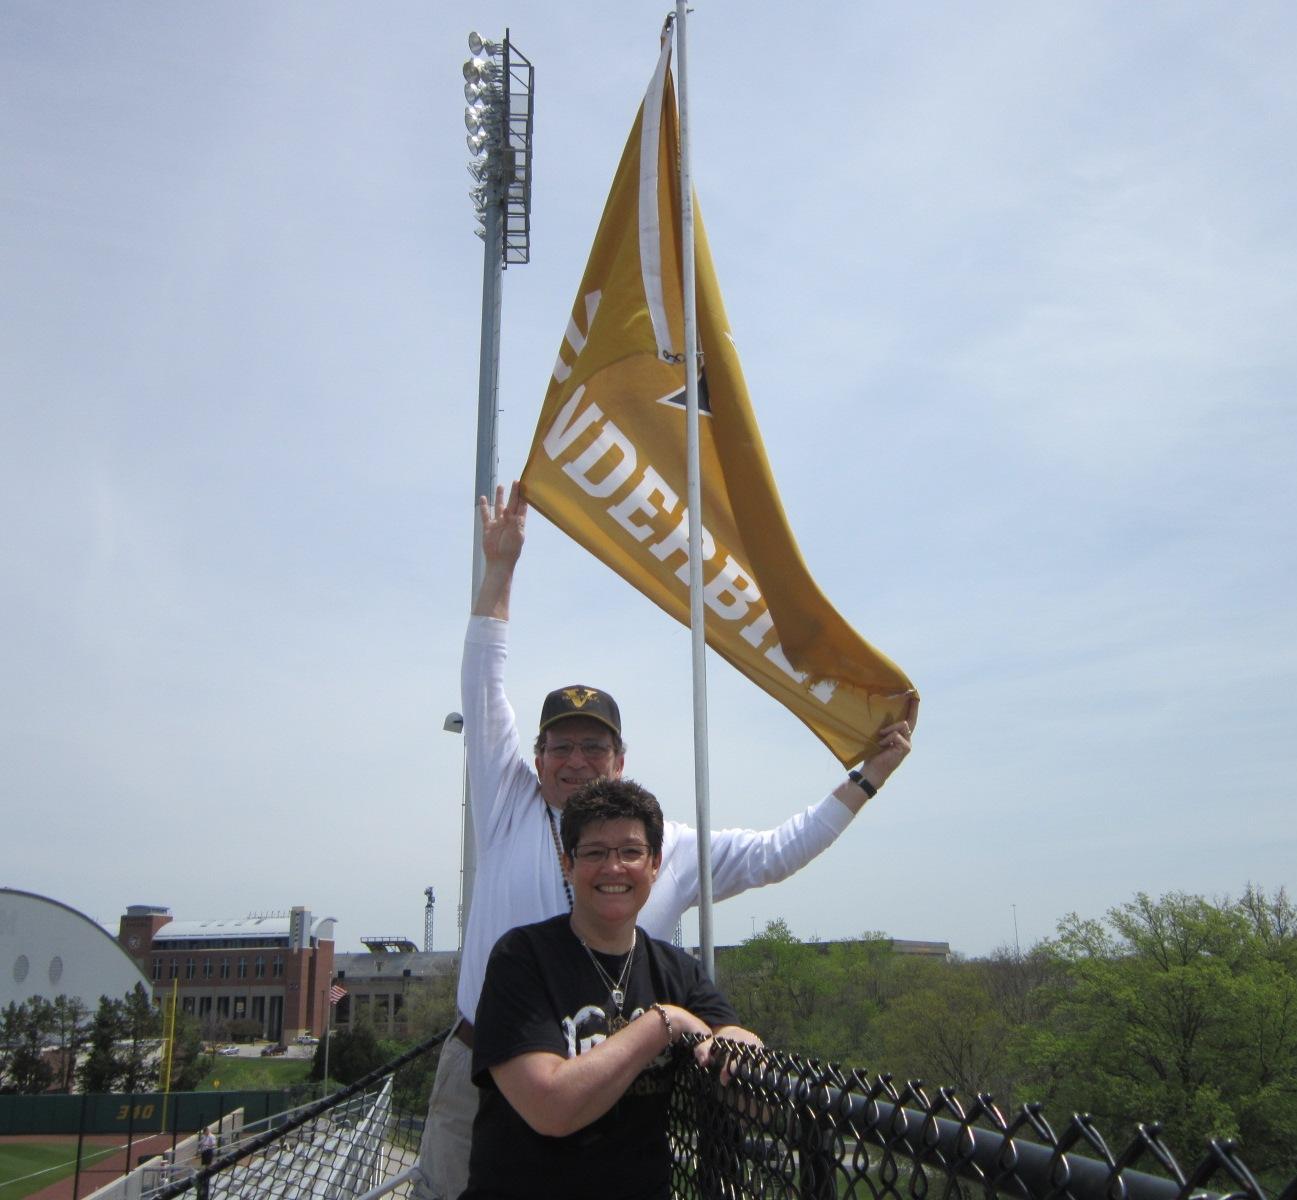 3 Chuck & Carla with Vanderbilt flag at Mizzou.JPG